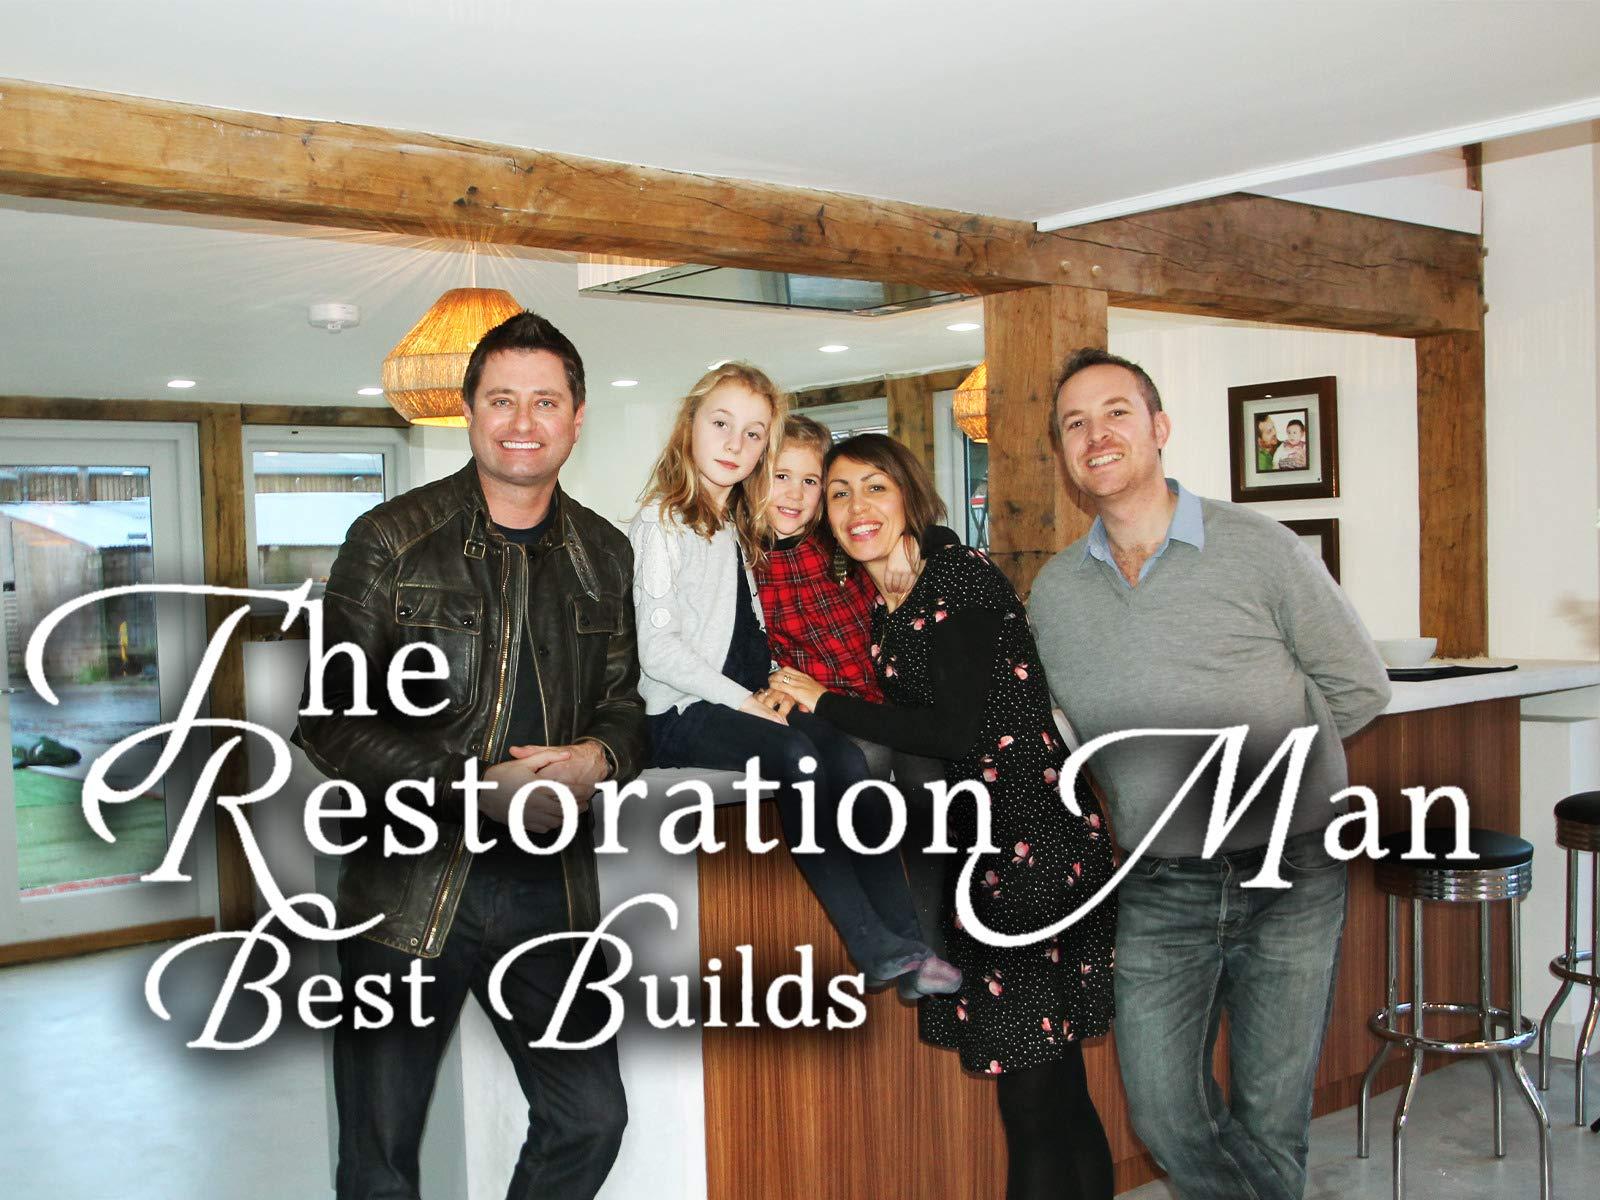 Restoration Man Best Builds